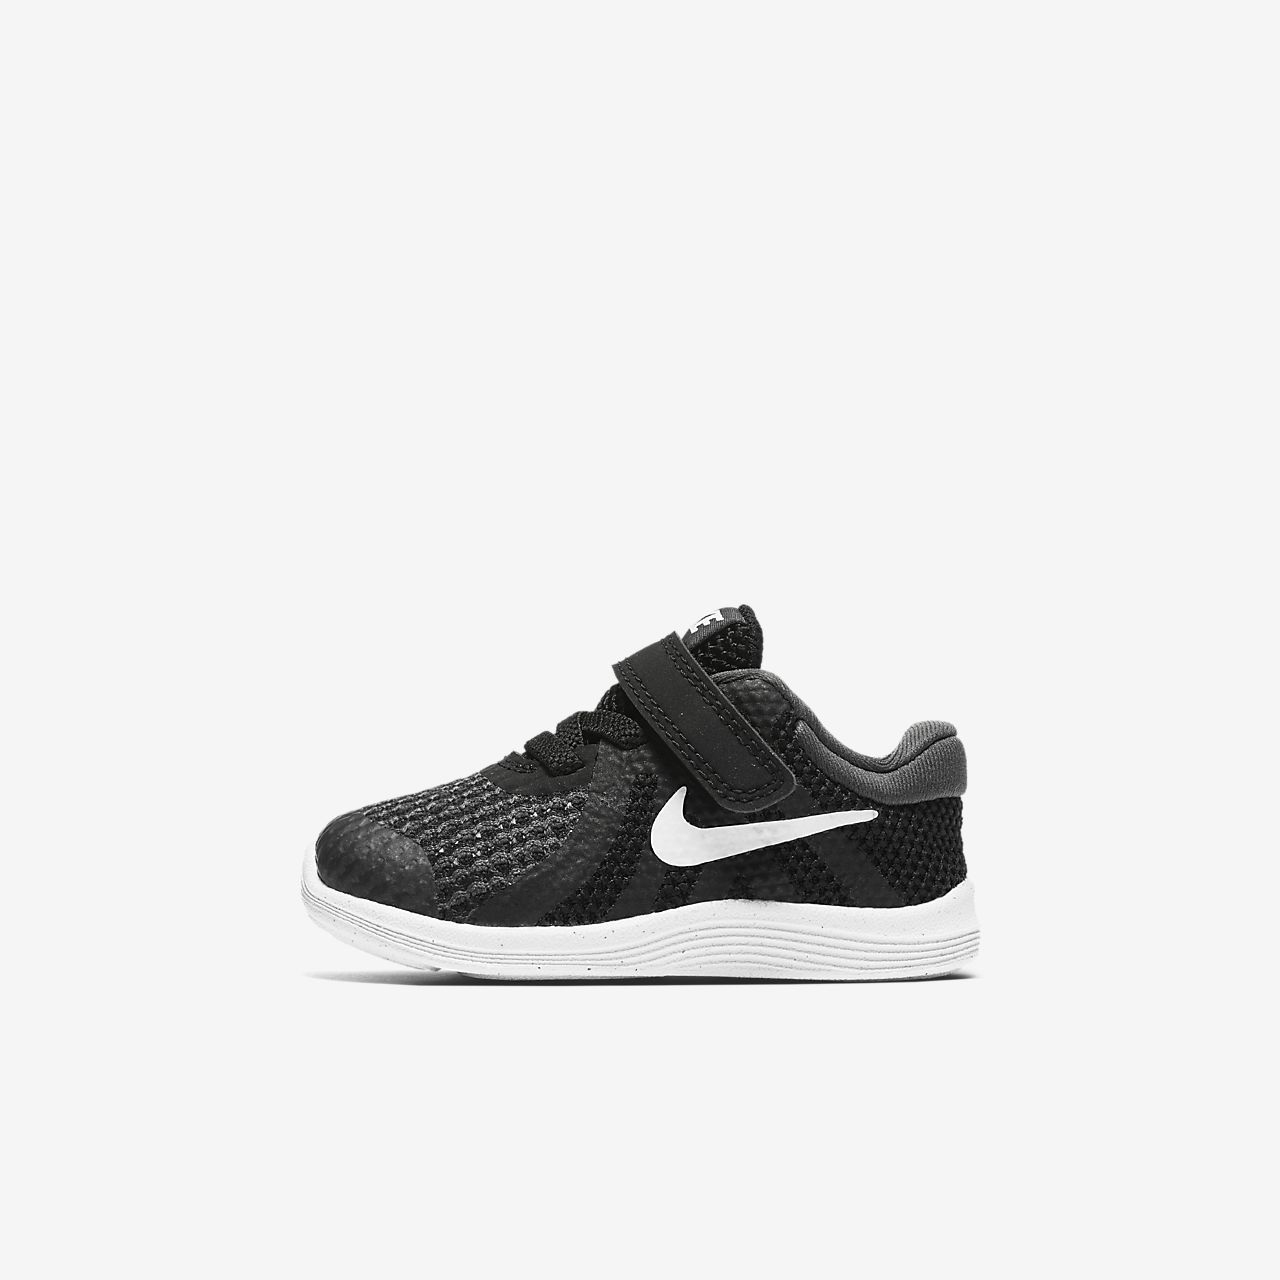 Toddler Revolution 4 Black White Anthracite Sneakers Nike 943304-006